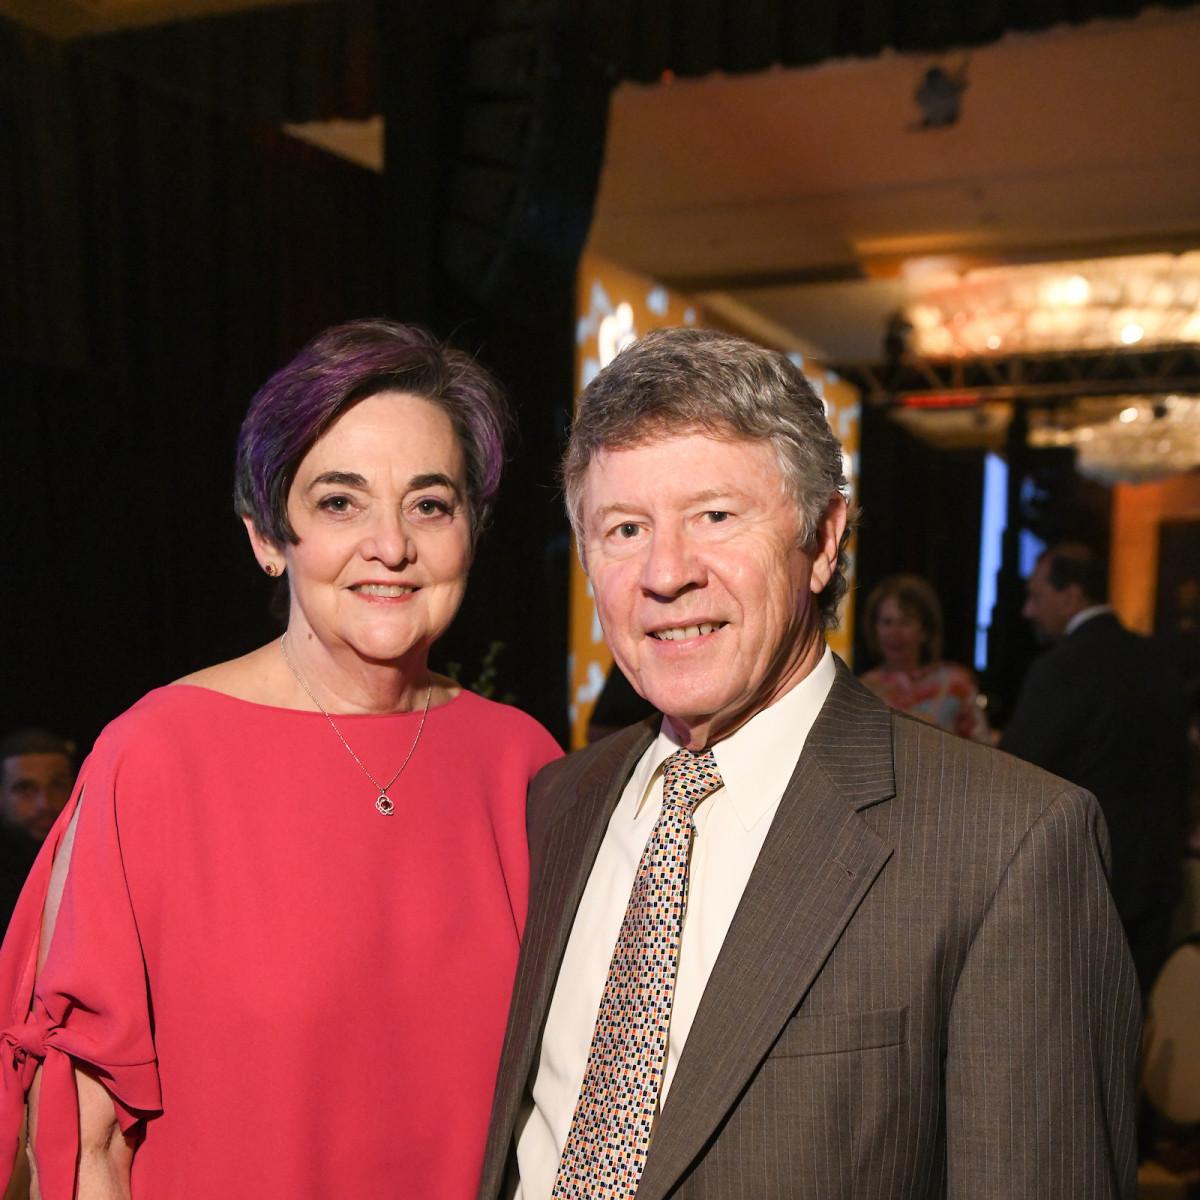 Gwen and Harris Countyu Judge Ed Emmett